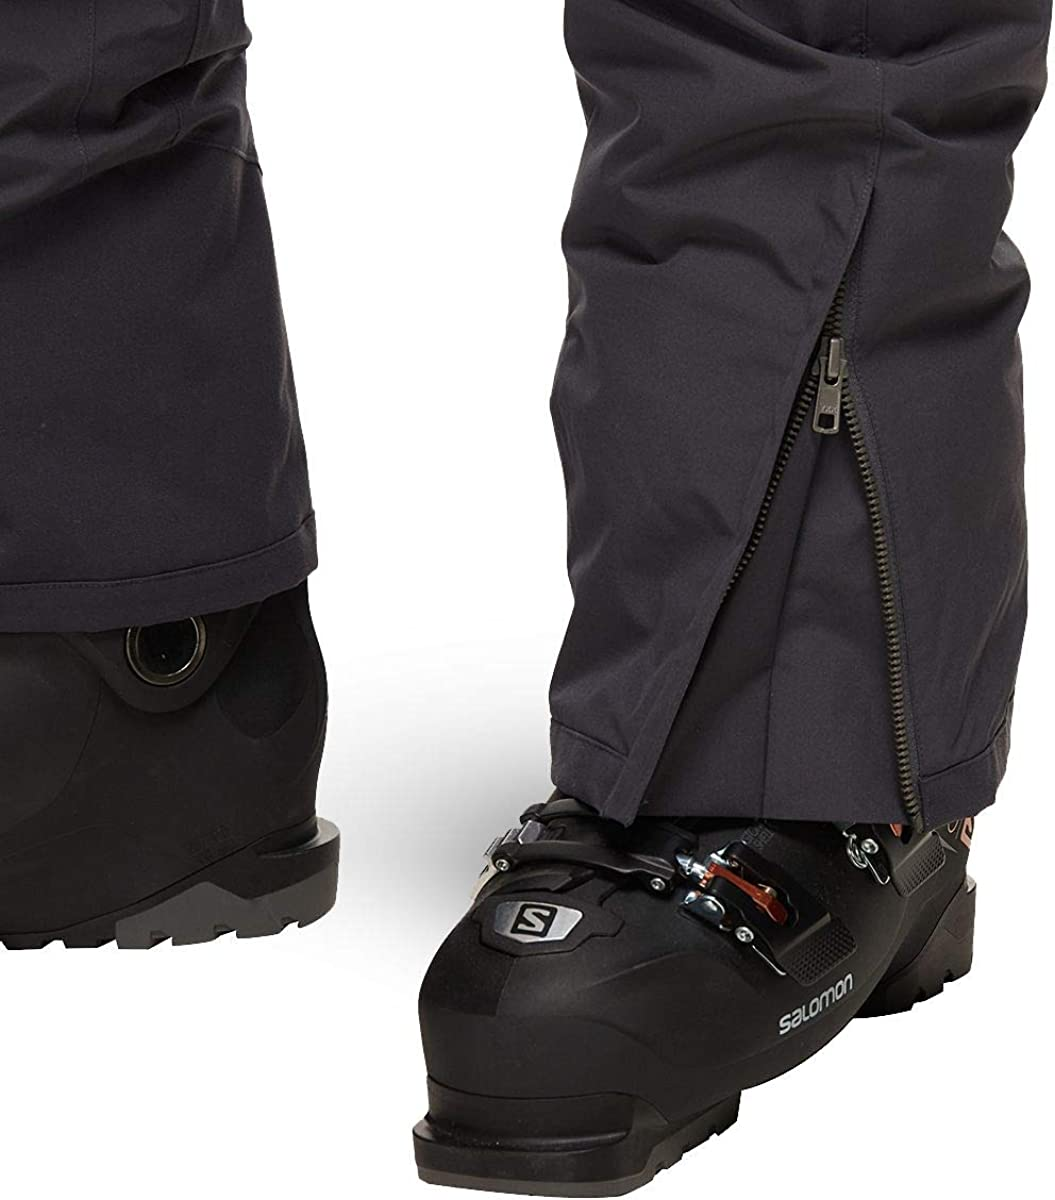 Flylow Womens Daisy Ski and Snowboard Pants